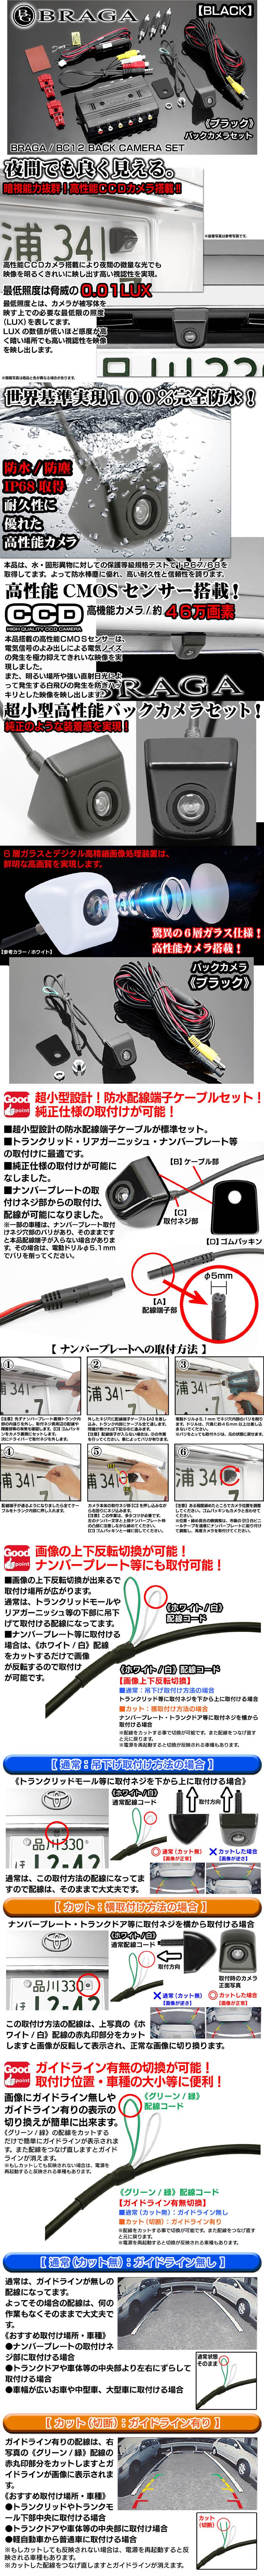 BC-12[バックカメラ+AVユニットセット]汎用品/純正マルチTV対応【ブラック】超小型高性能CCDカメラ搭載/広角170°防水防塵IP68/12V専用/1年保証《BRAGA/ブラガ》